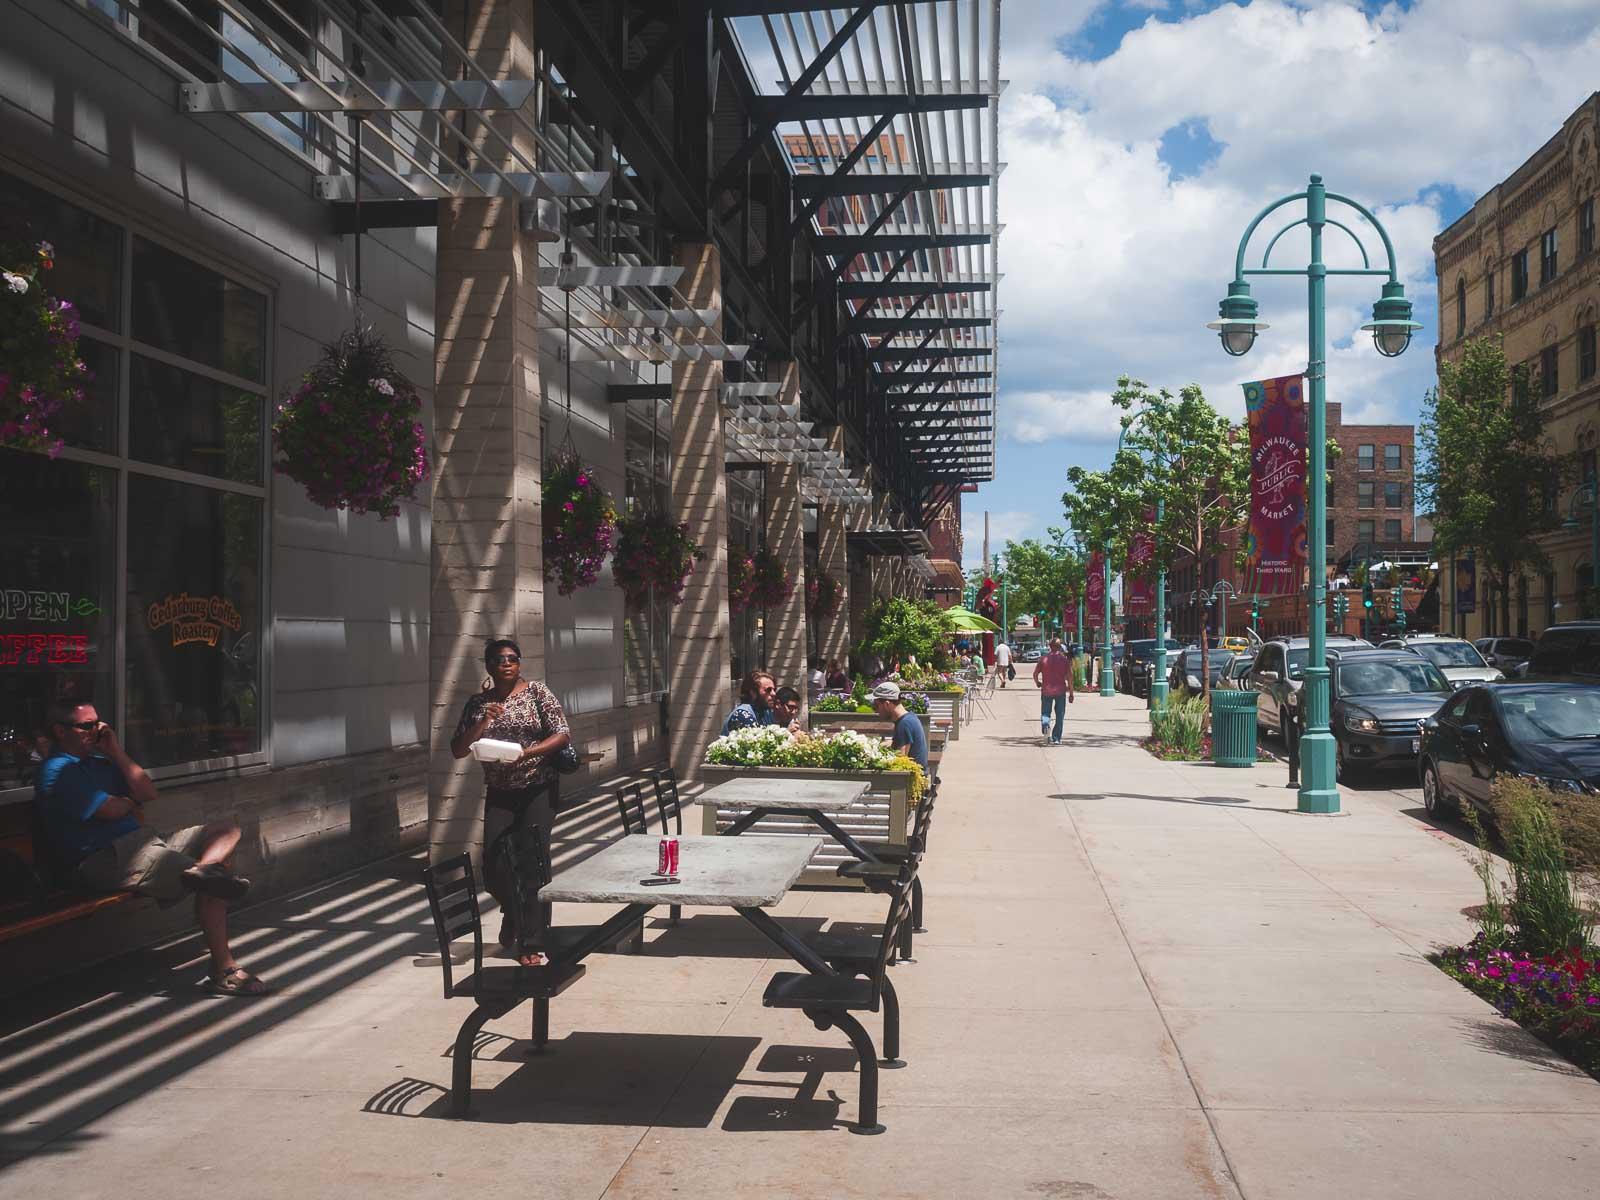 The Third Ward in Milwaukee